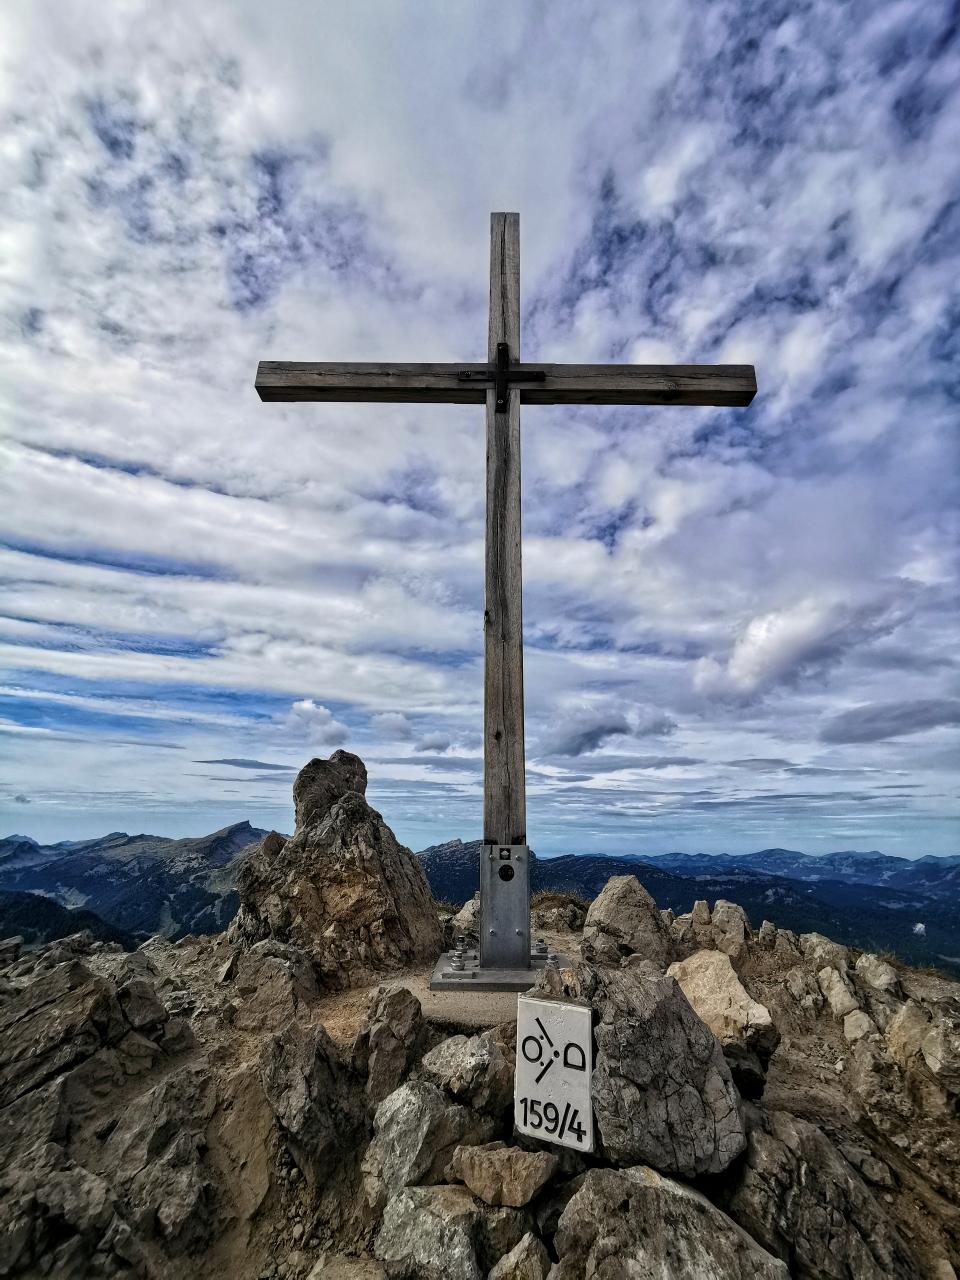 Am Gipfel der Kanzelwand